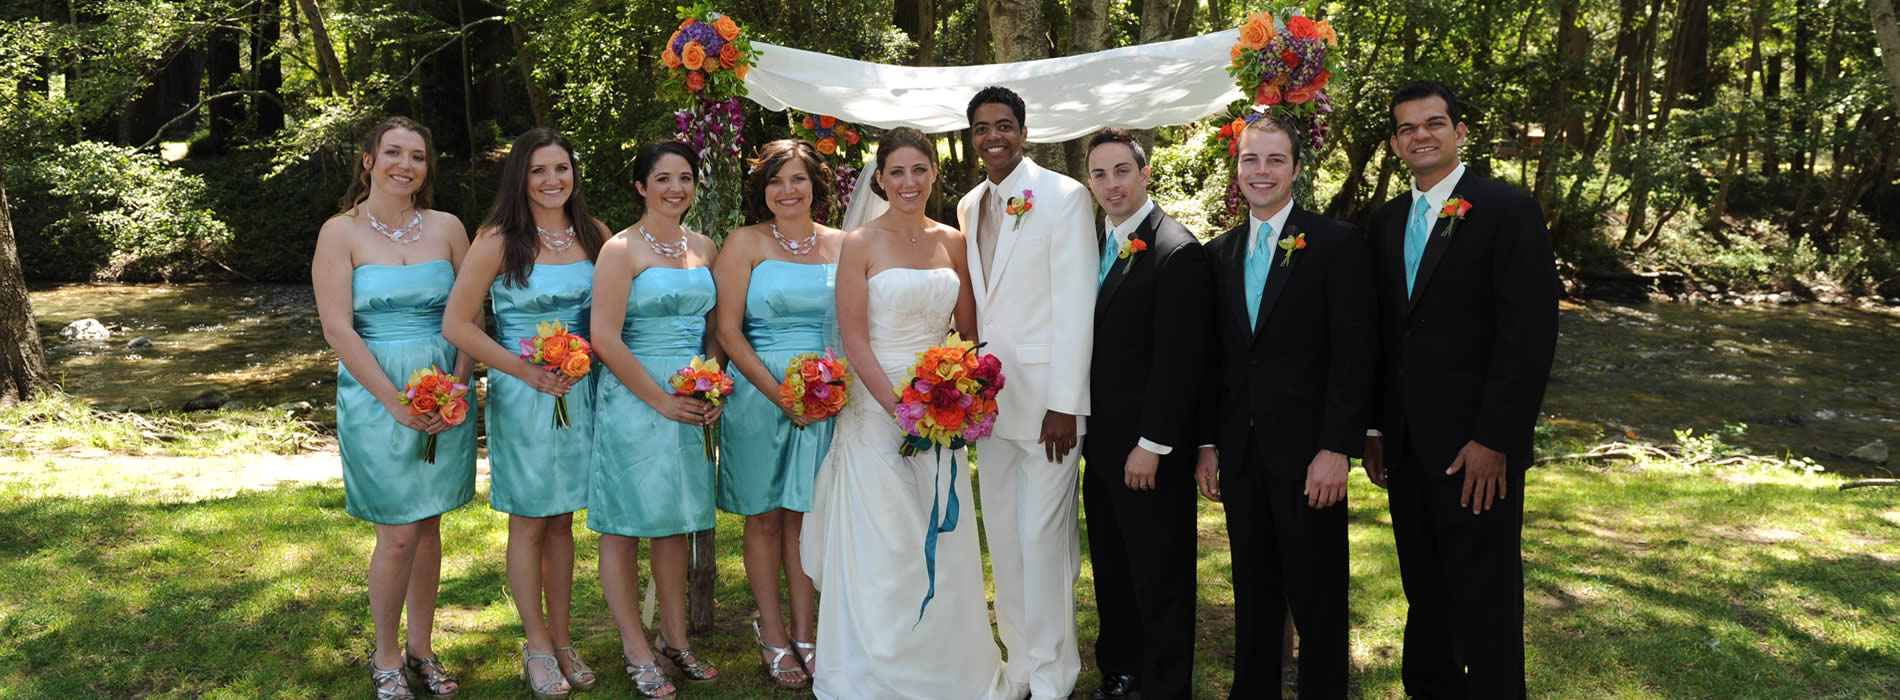 big sur weddings and receptions